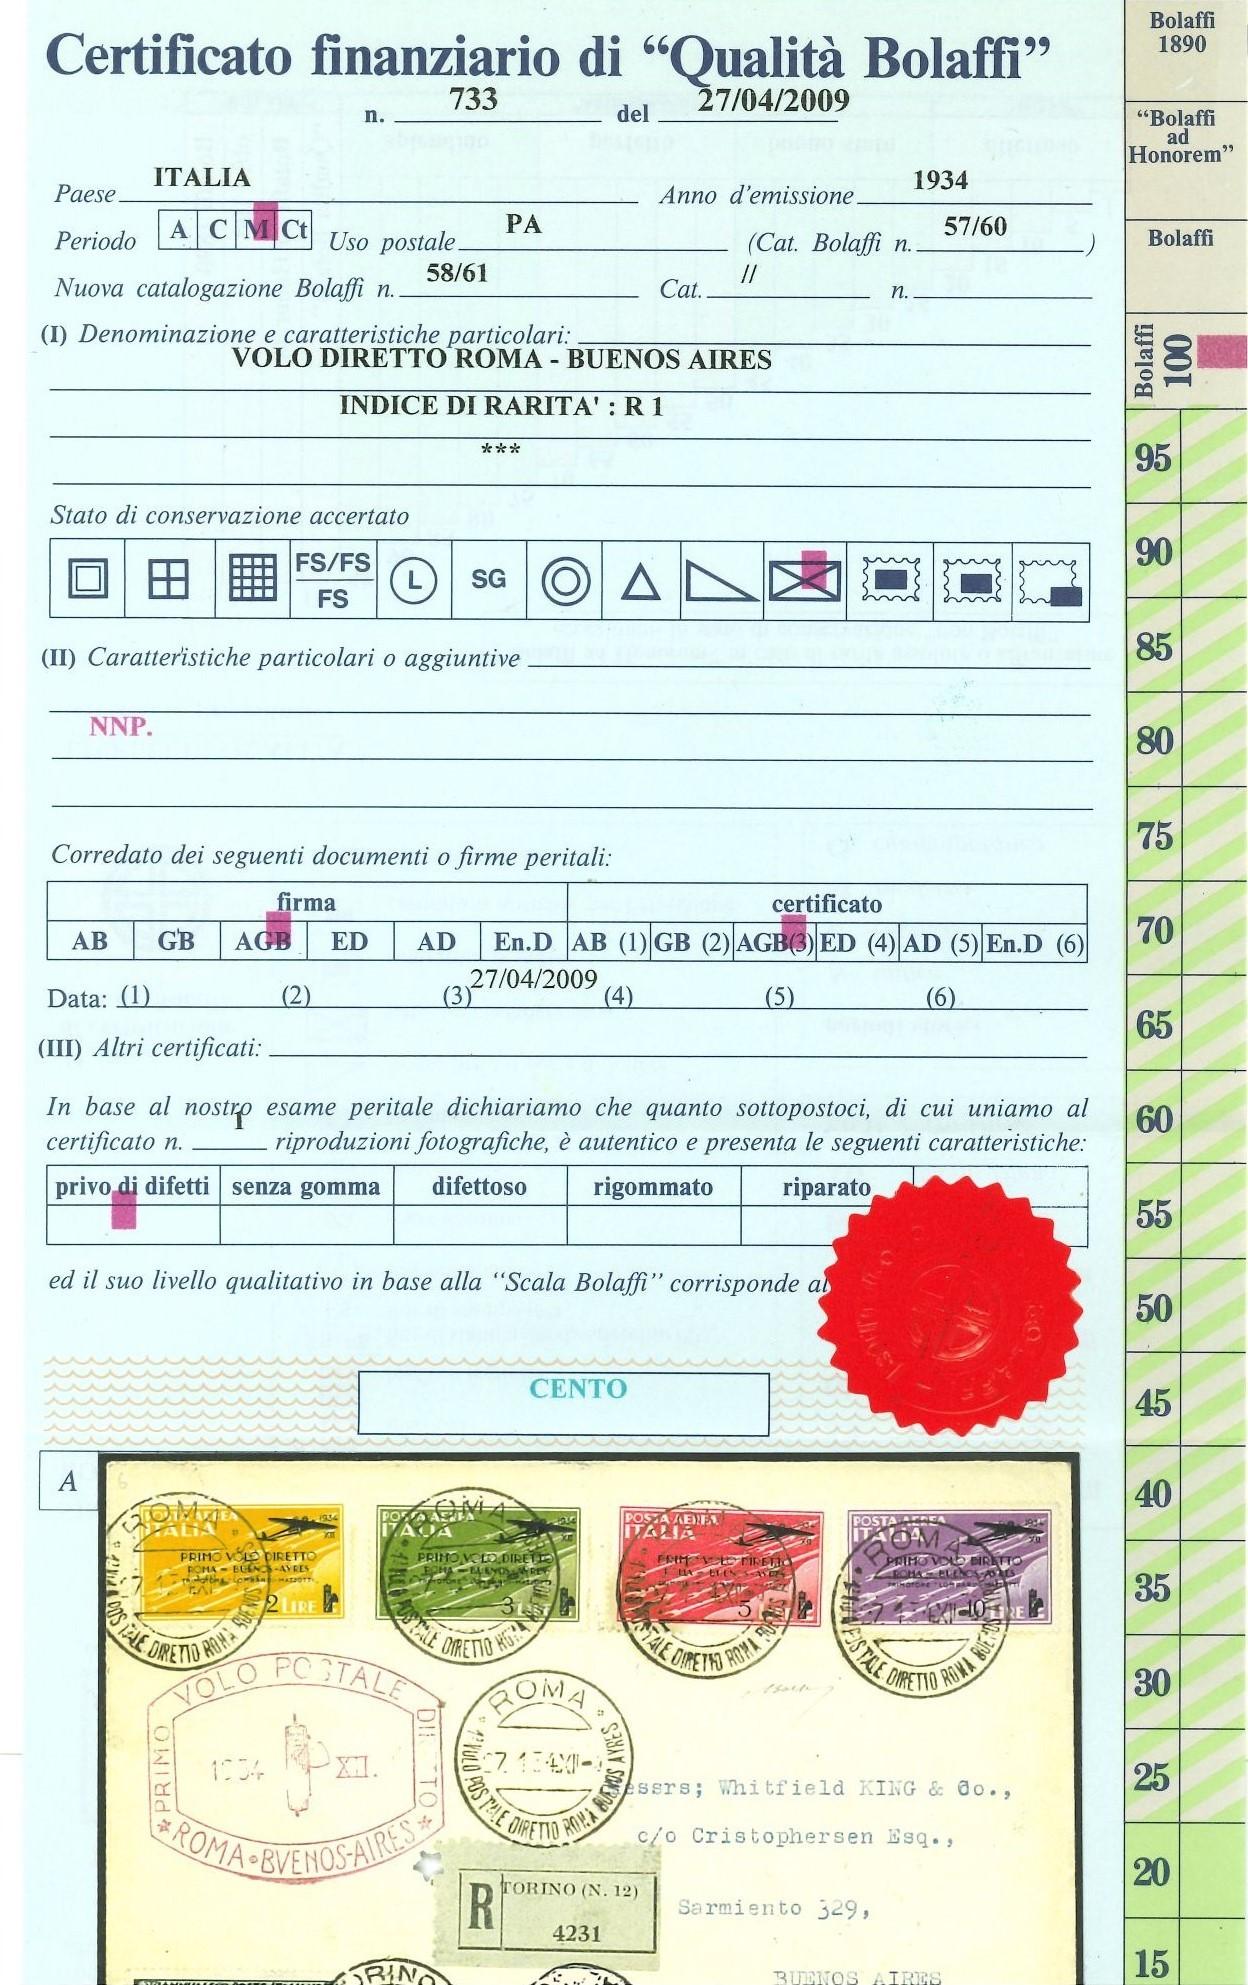 Lot 2431 - REGNO D'ITALIA Individual lots -  Ponte Auction House Stamps Auction 505